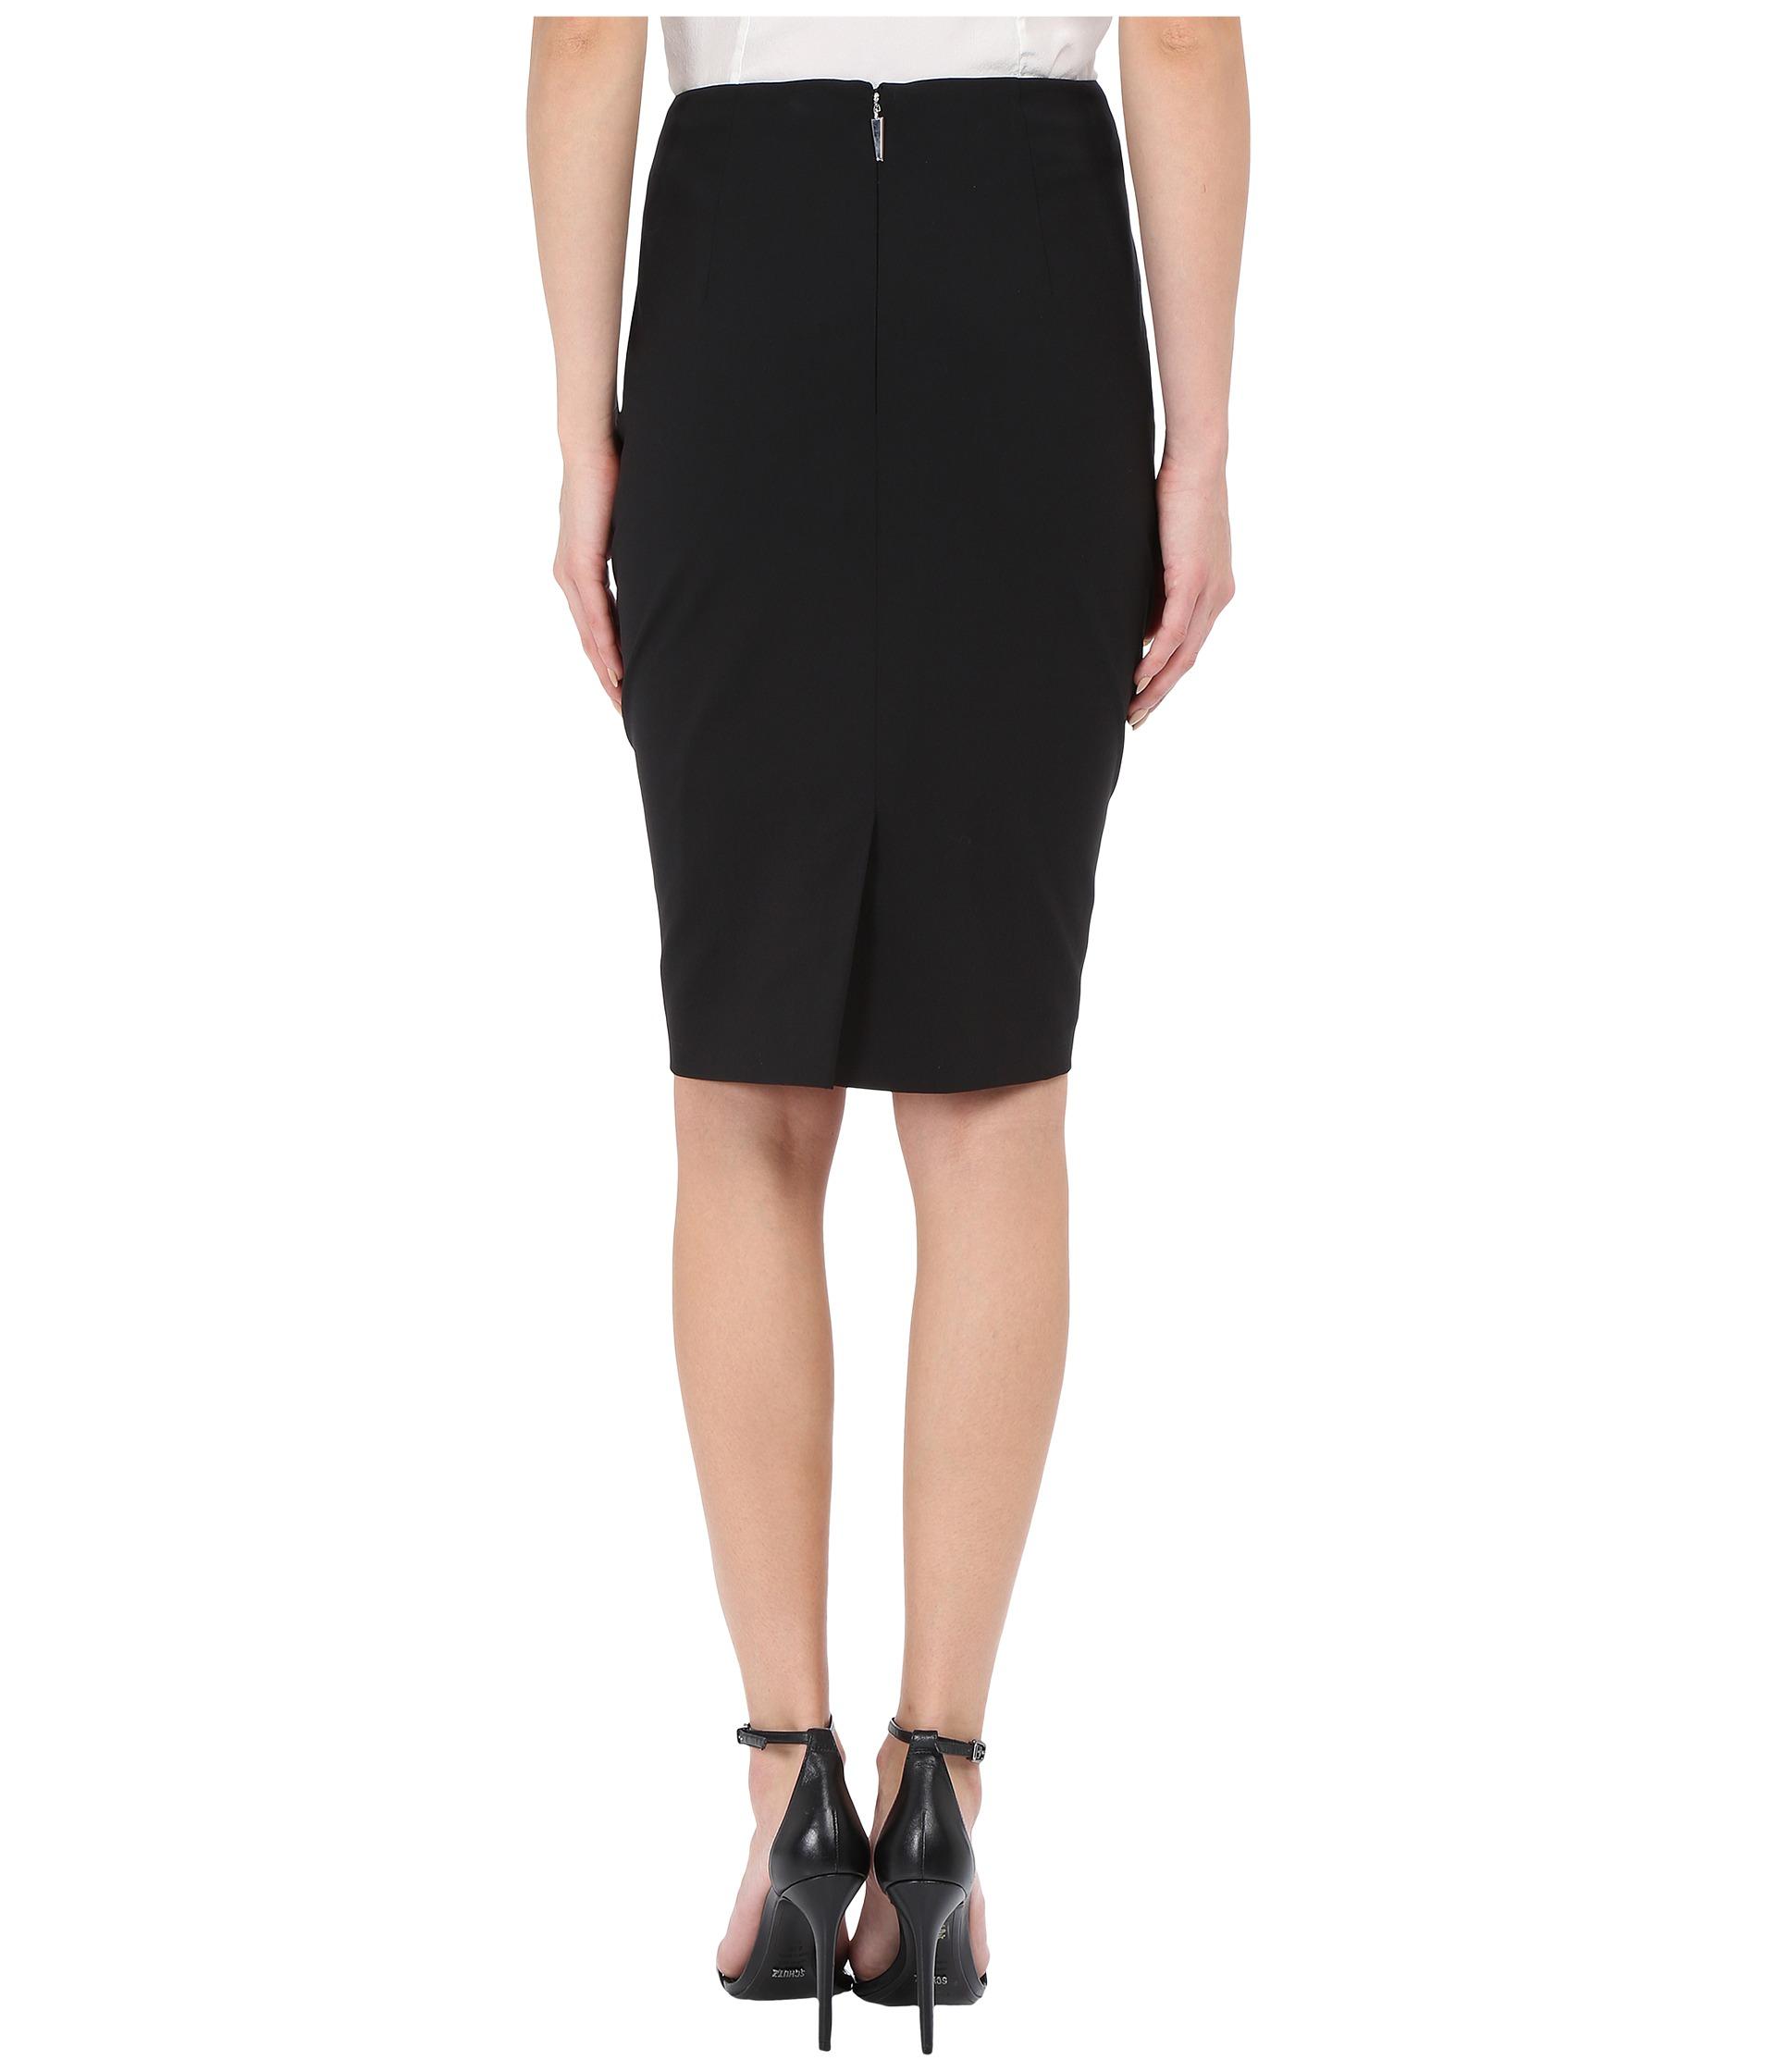 prabal gurung stretch wool knee length skirt at zappos